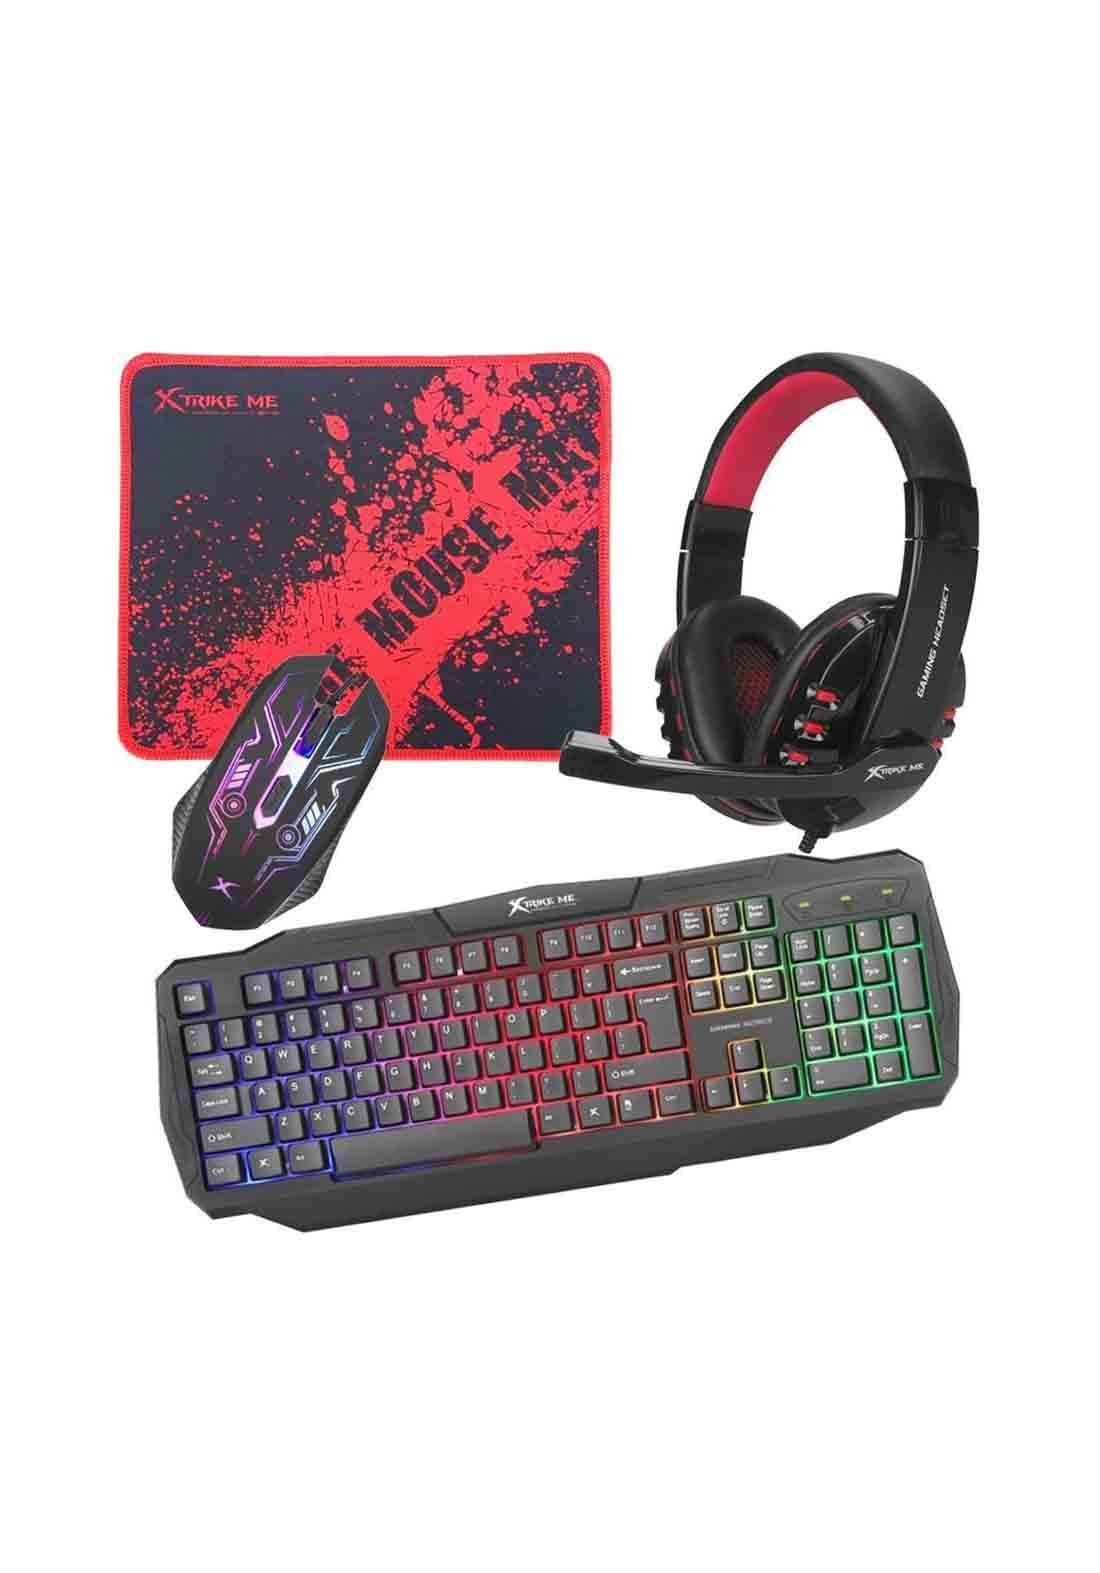 Xtrike Me Cm-406 4 in 1 Multimedia Gaming Keyboard, Headset, Mouse and Mousepad Combo - Black سيت كيبورد ماوس سماعة ولوح ماوس